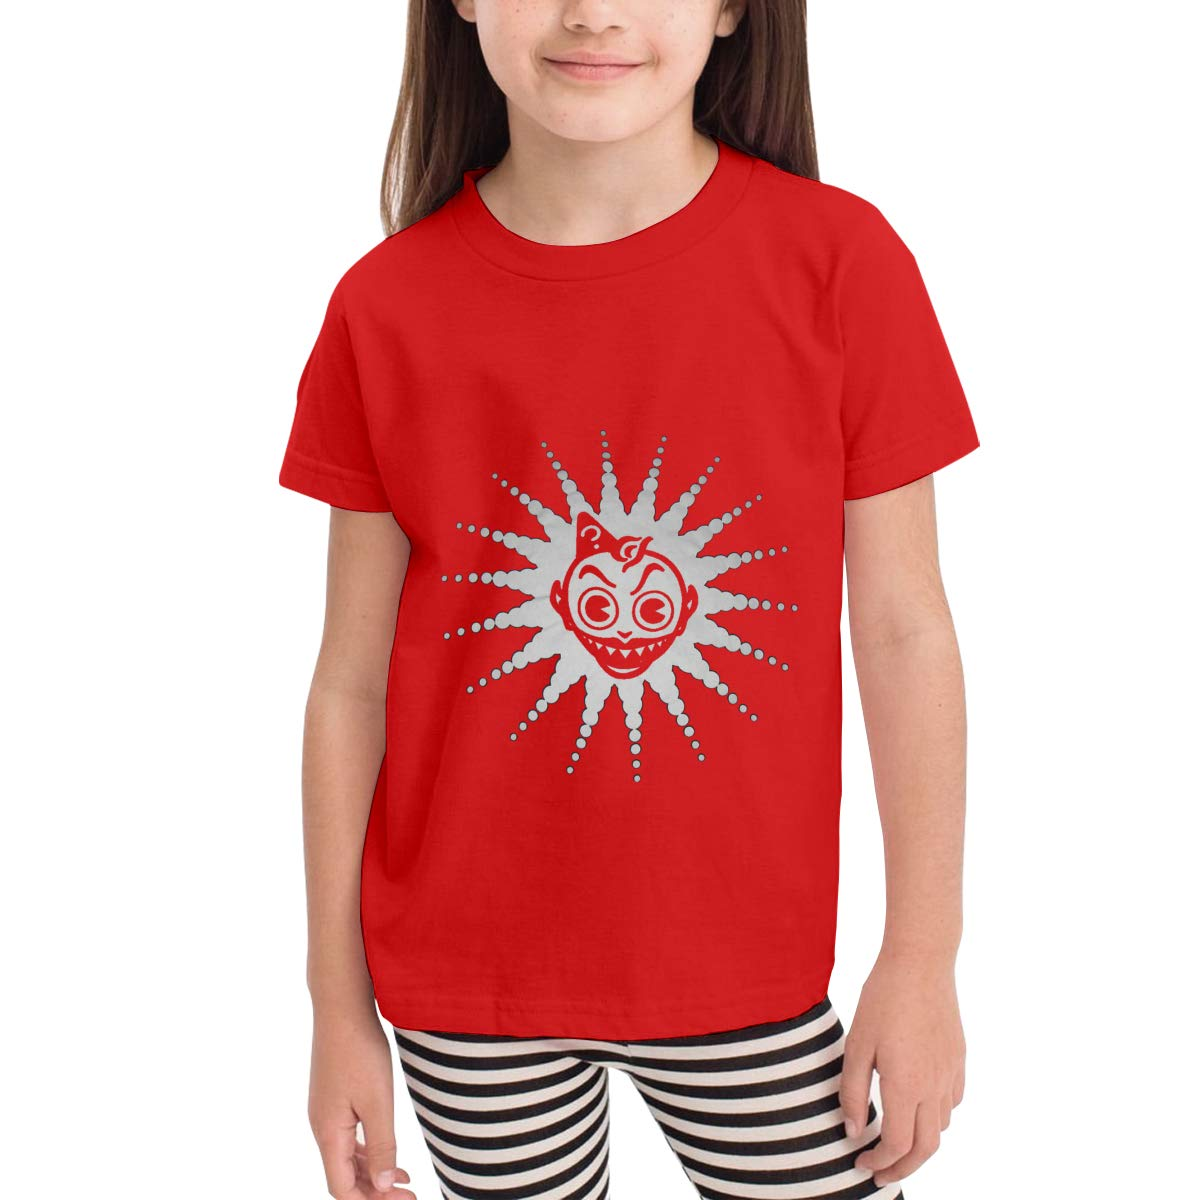 Onlybabycare Jesus Jones 100/% Cotton Toddler Baby Boys Girls Kids Short Sleeve T Shirt Top Tee Clothes 2-6 T